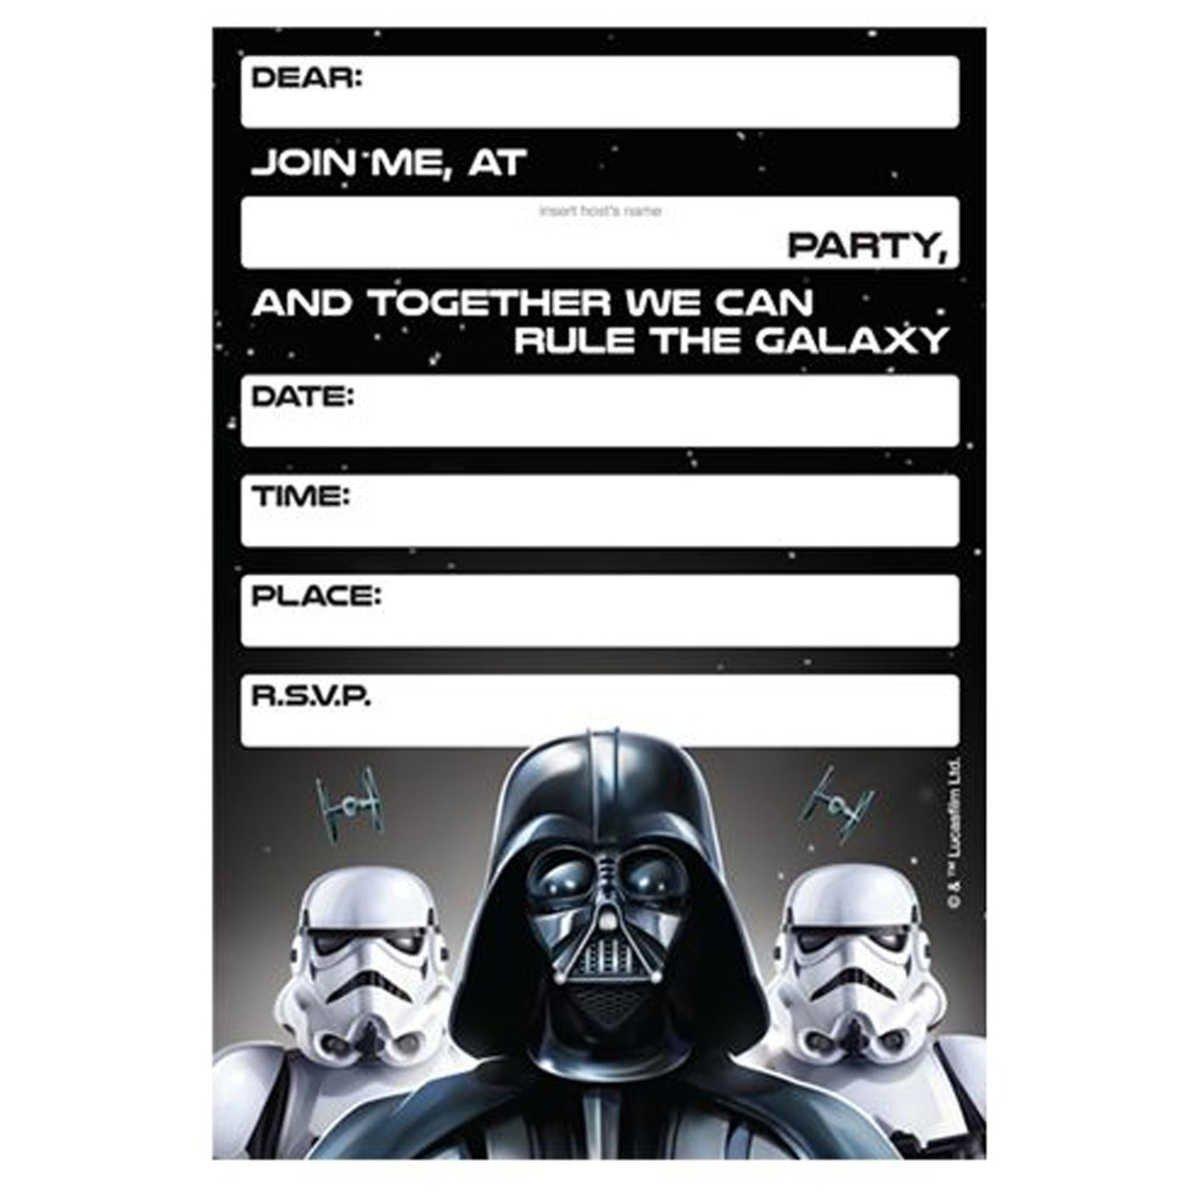 Star Wars Invitation Templates Lego Star Wars Birthday Invitations Template – Bagvania